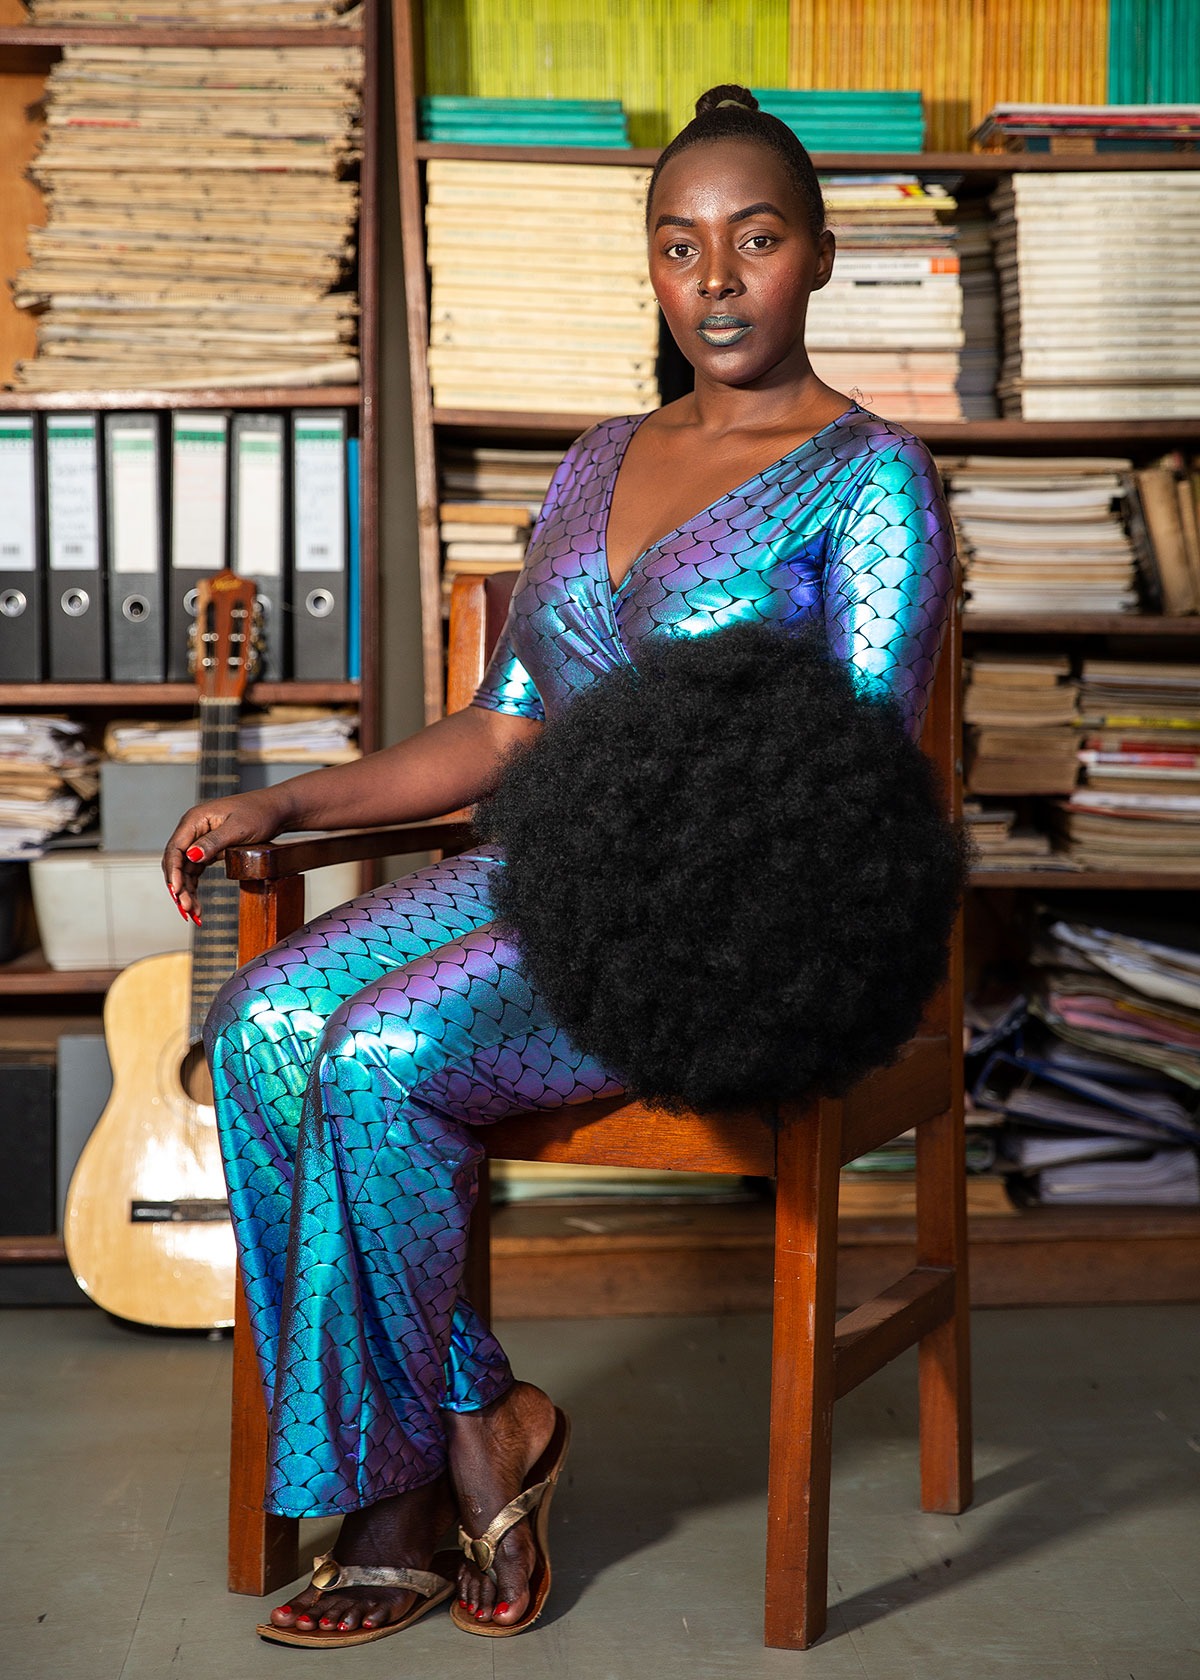 poet-artist-woman-uganda-5x7